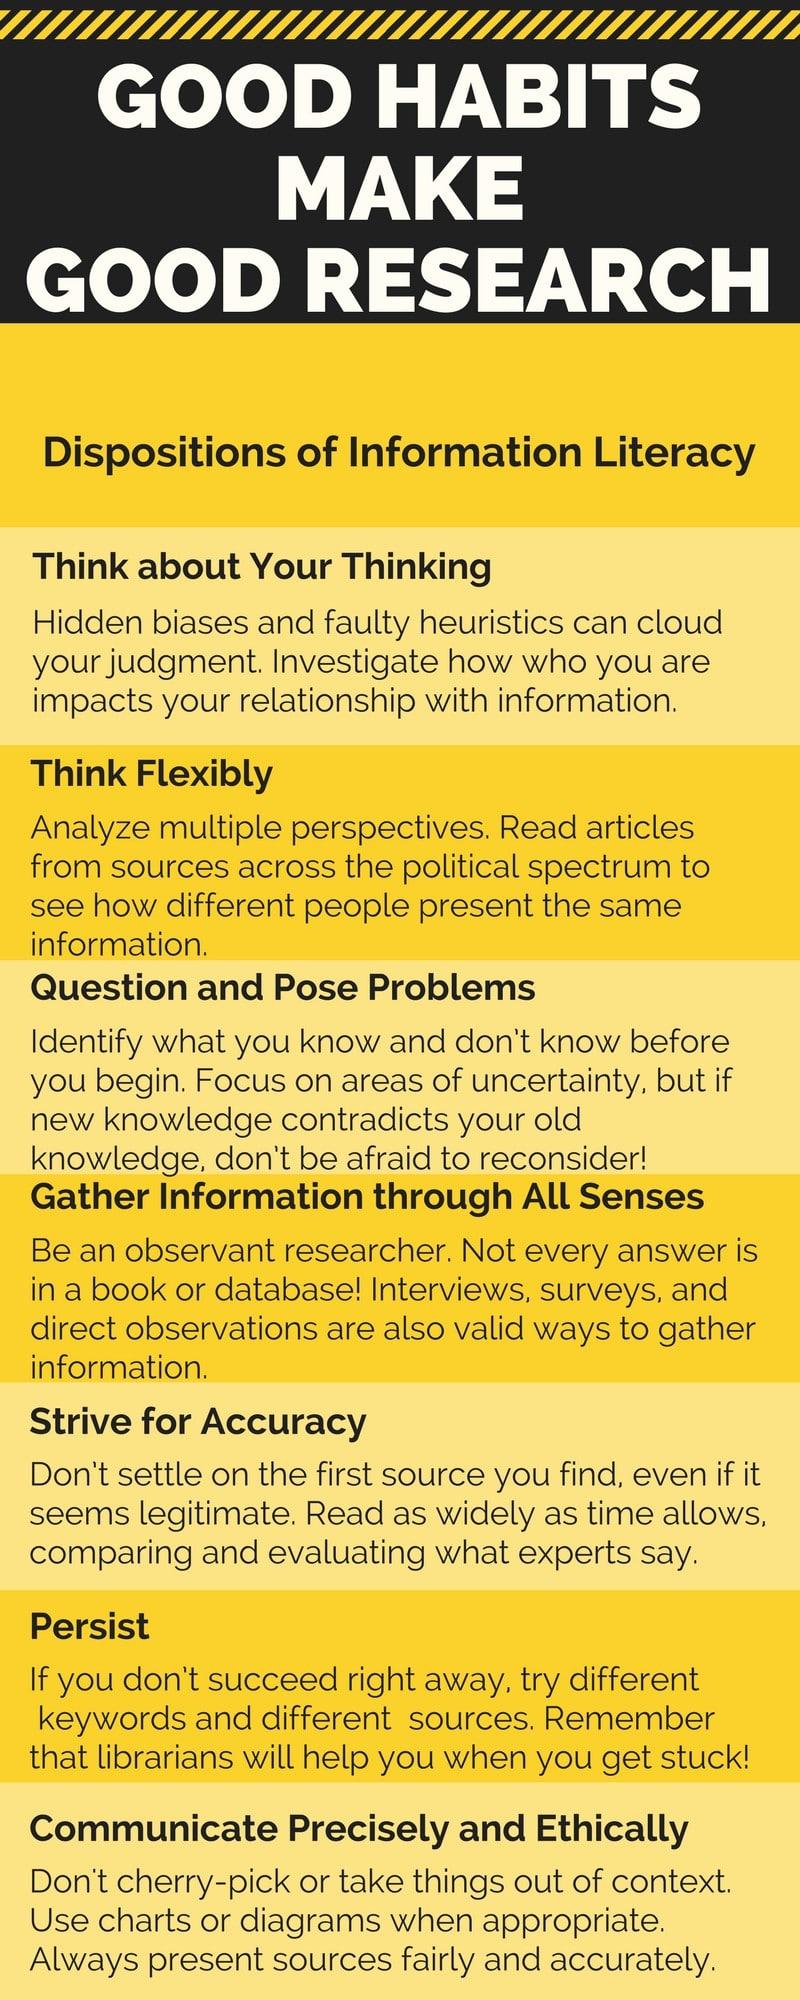 Good Habits Make Good Research